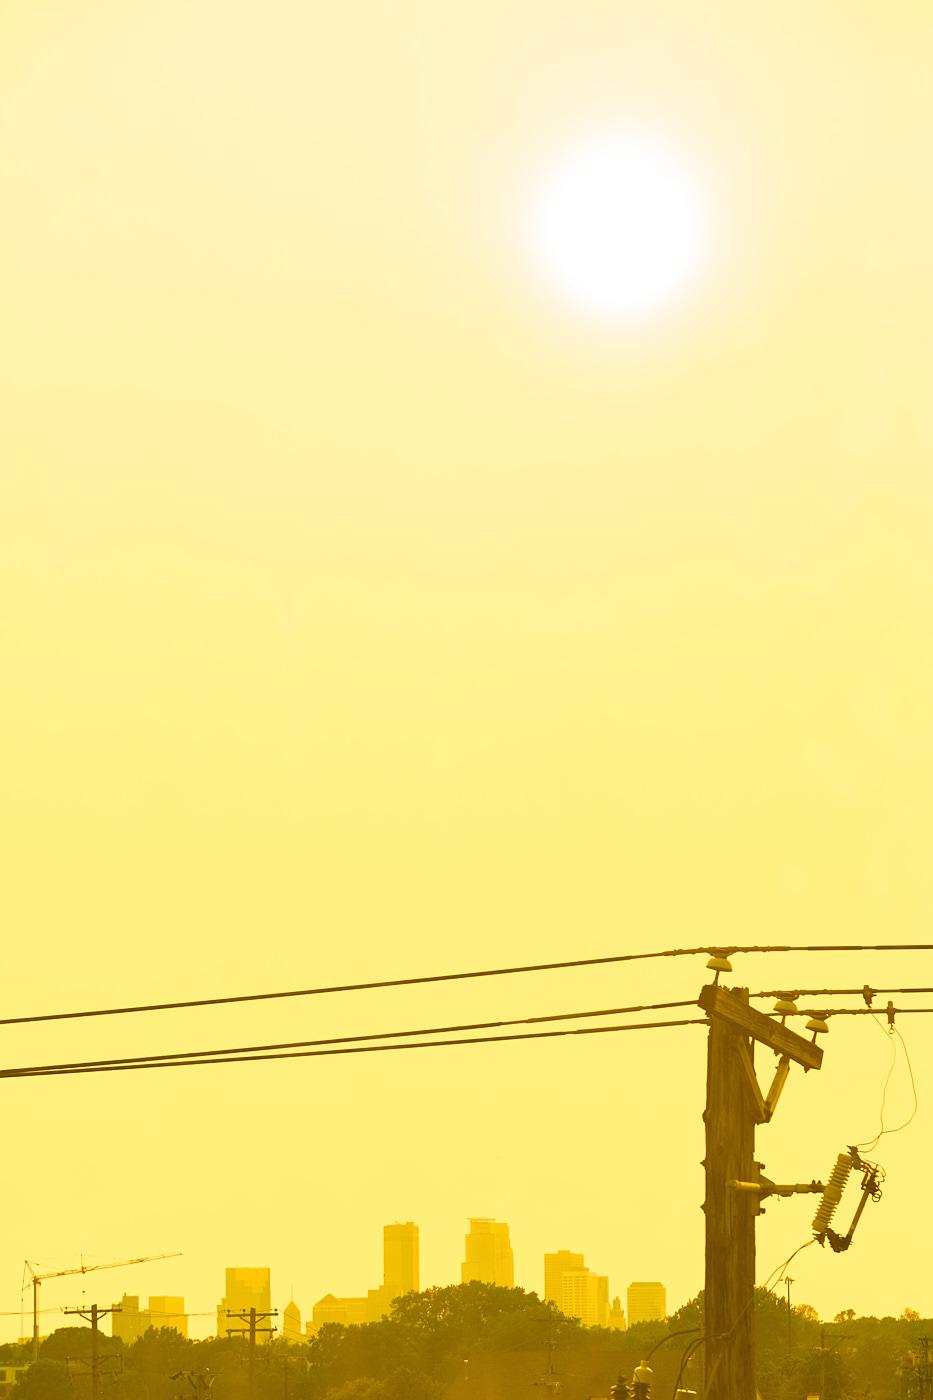 Sunlight - Yellow